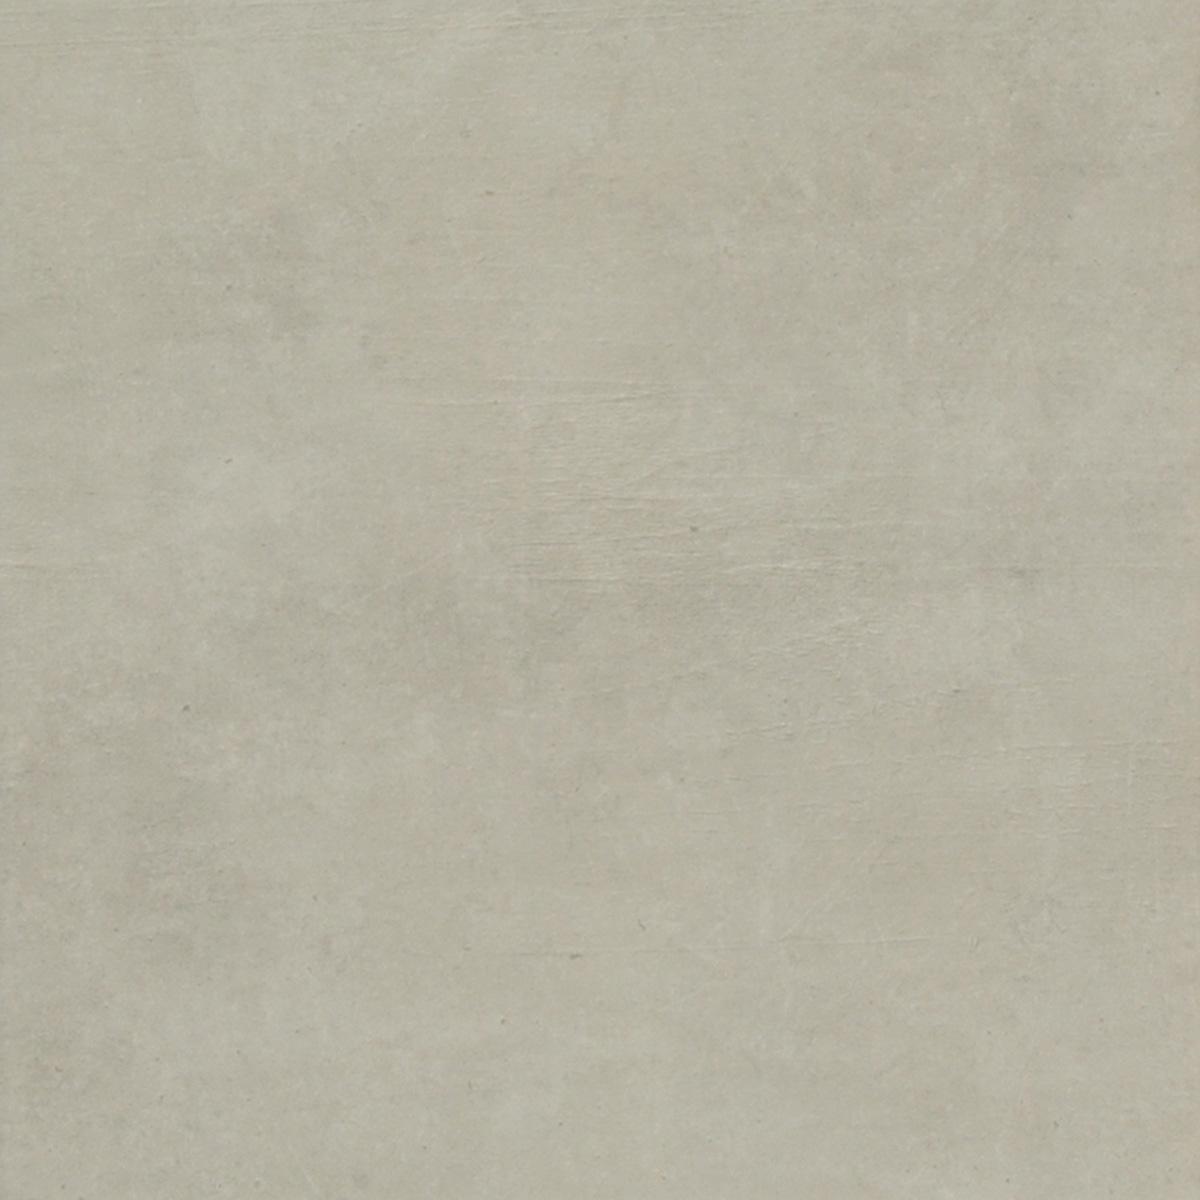 Gresie portelanata glazurata SIENA - Perla 44.5x44.5 GALA - Poza 3